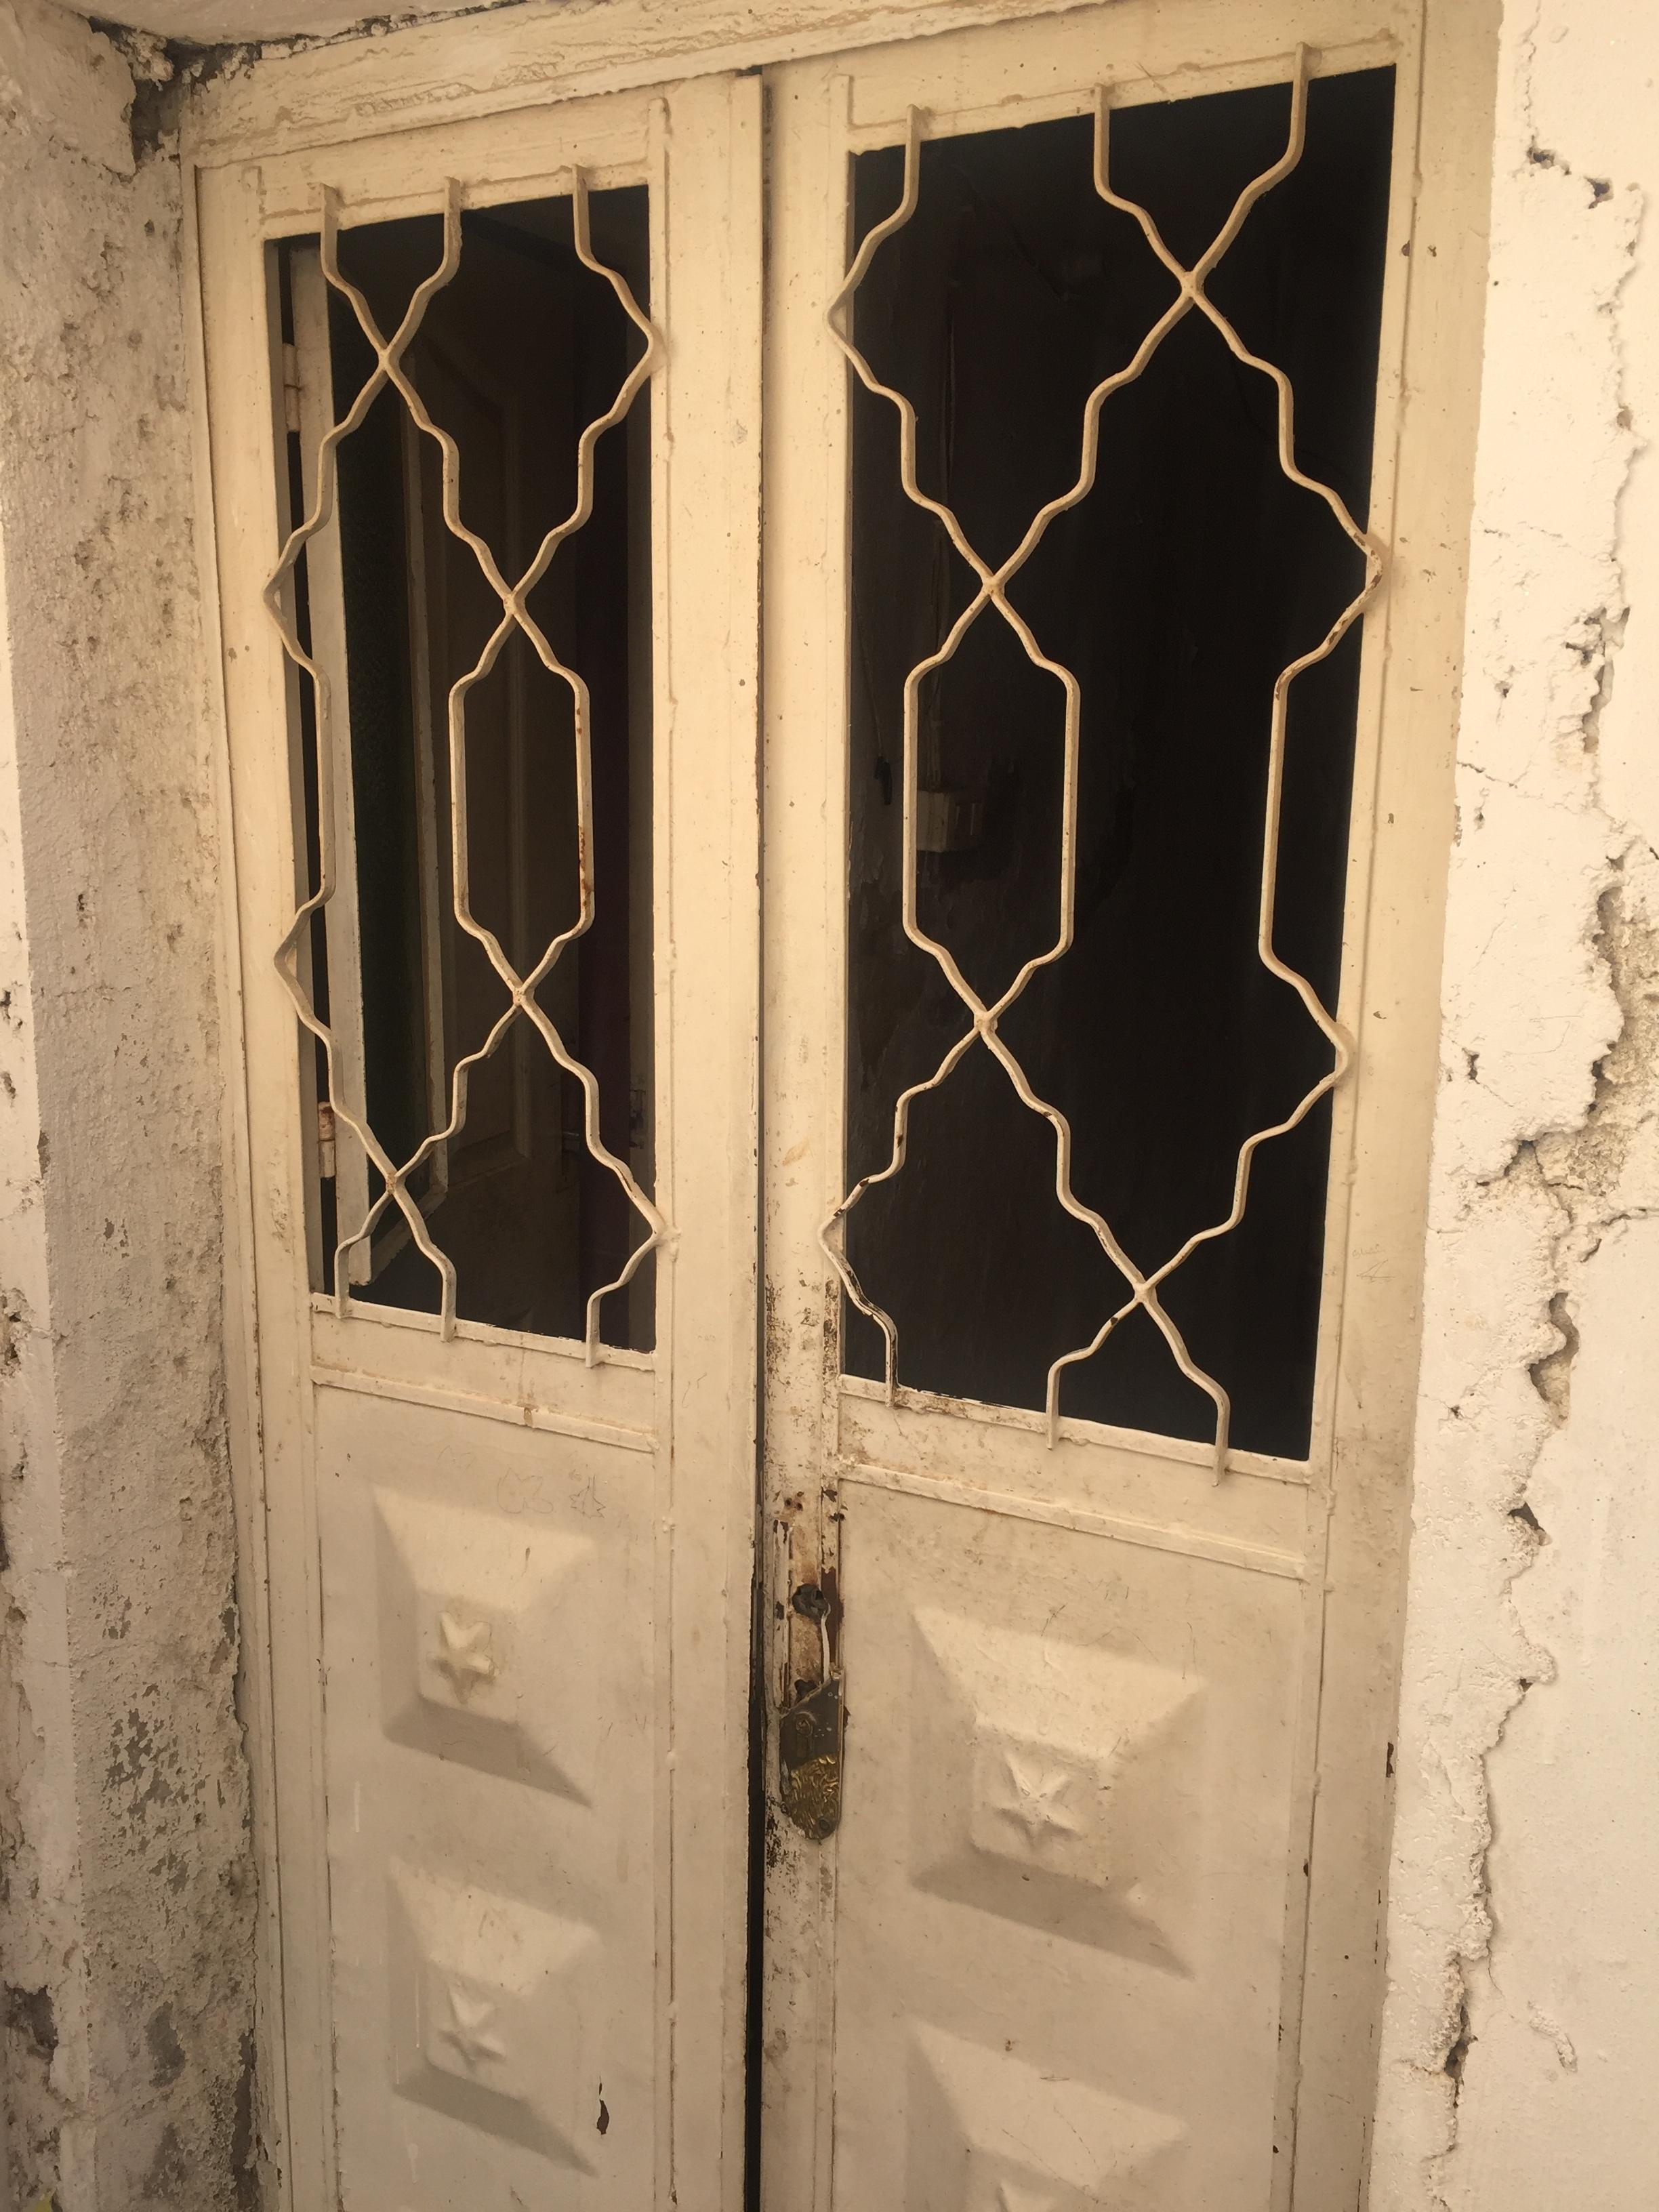 Before - Broken windows and a door that does not lock